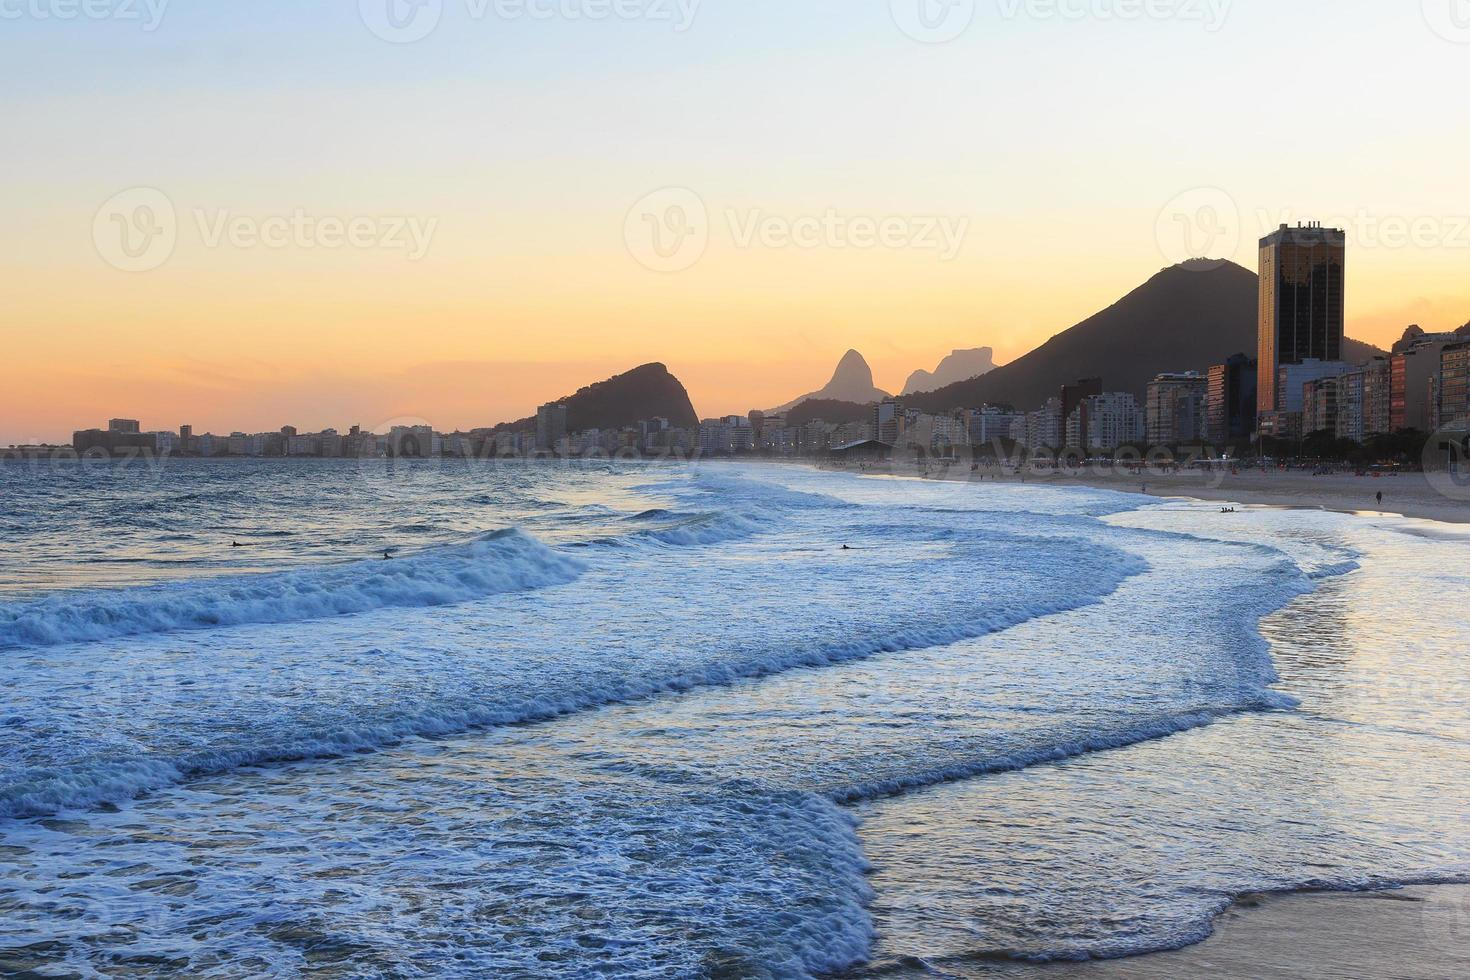 Copacabana Strand, Berg Vidigal, Pedra da Gavea, Meer in der Sonne foto